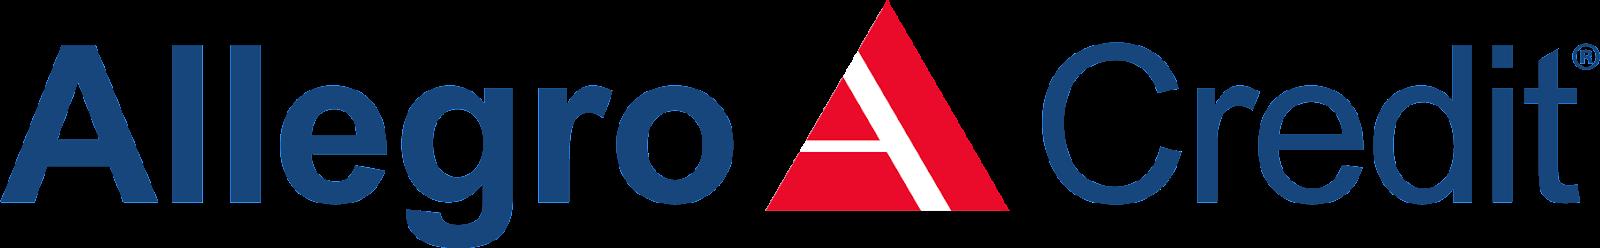 Allegro_Credit_Logo (002).png